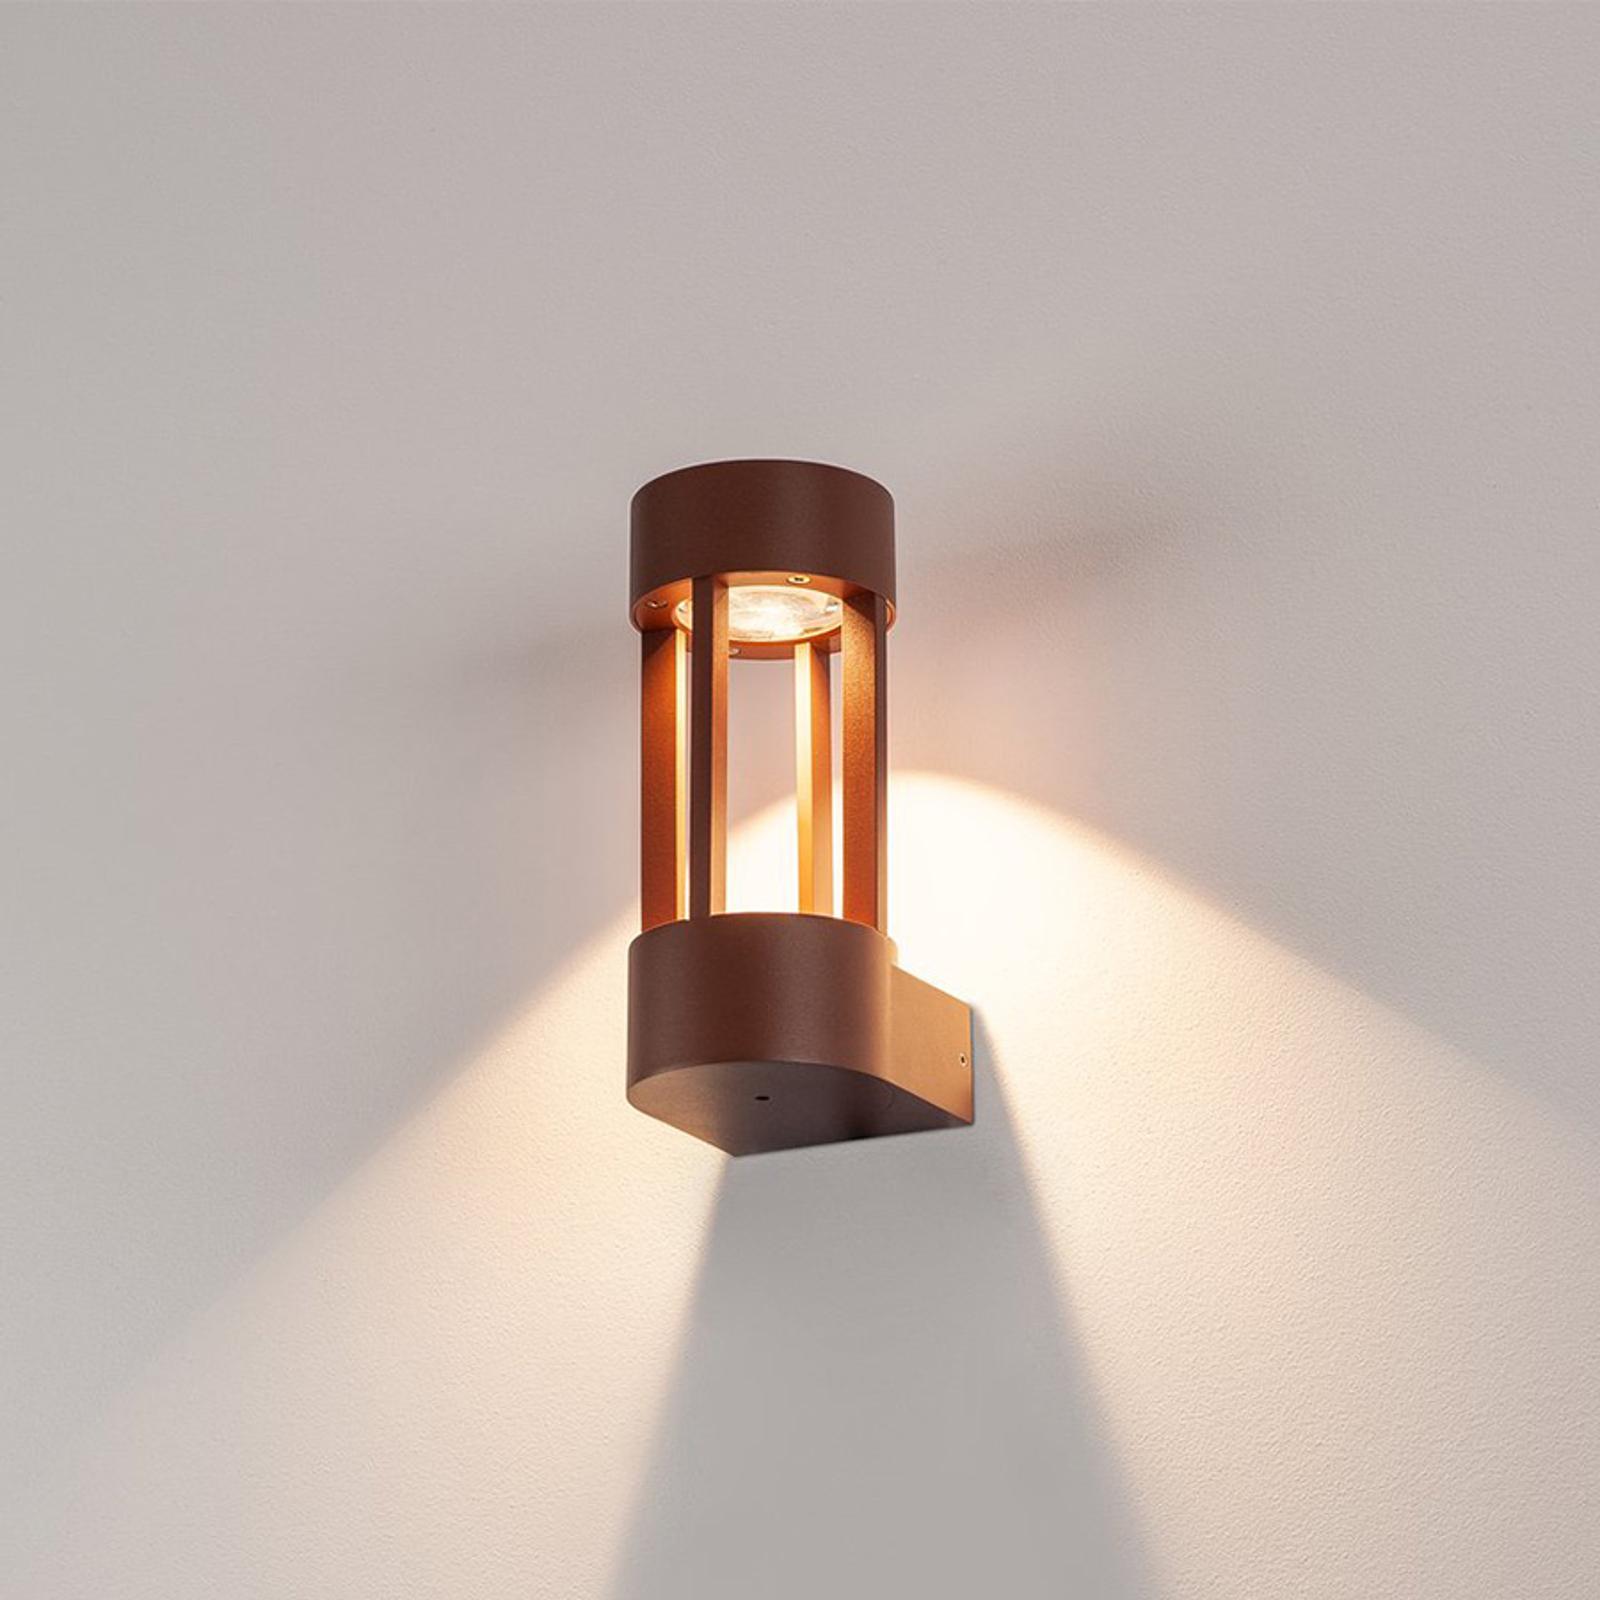 Lampada da parete LED Slot Wall ruggine